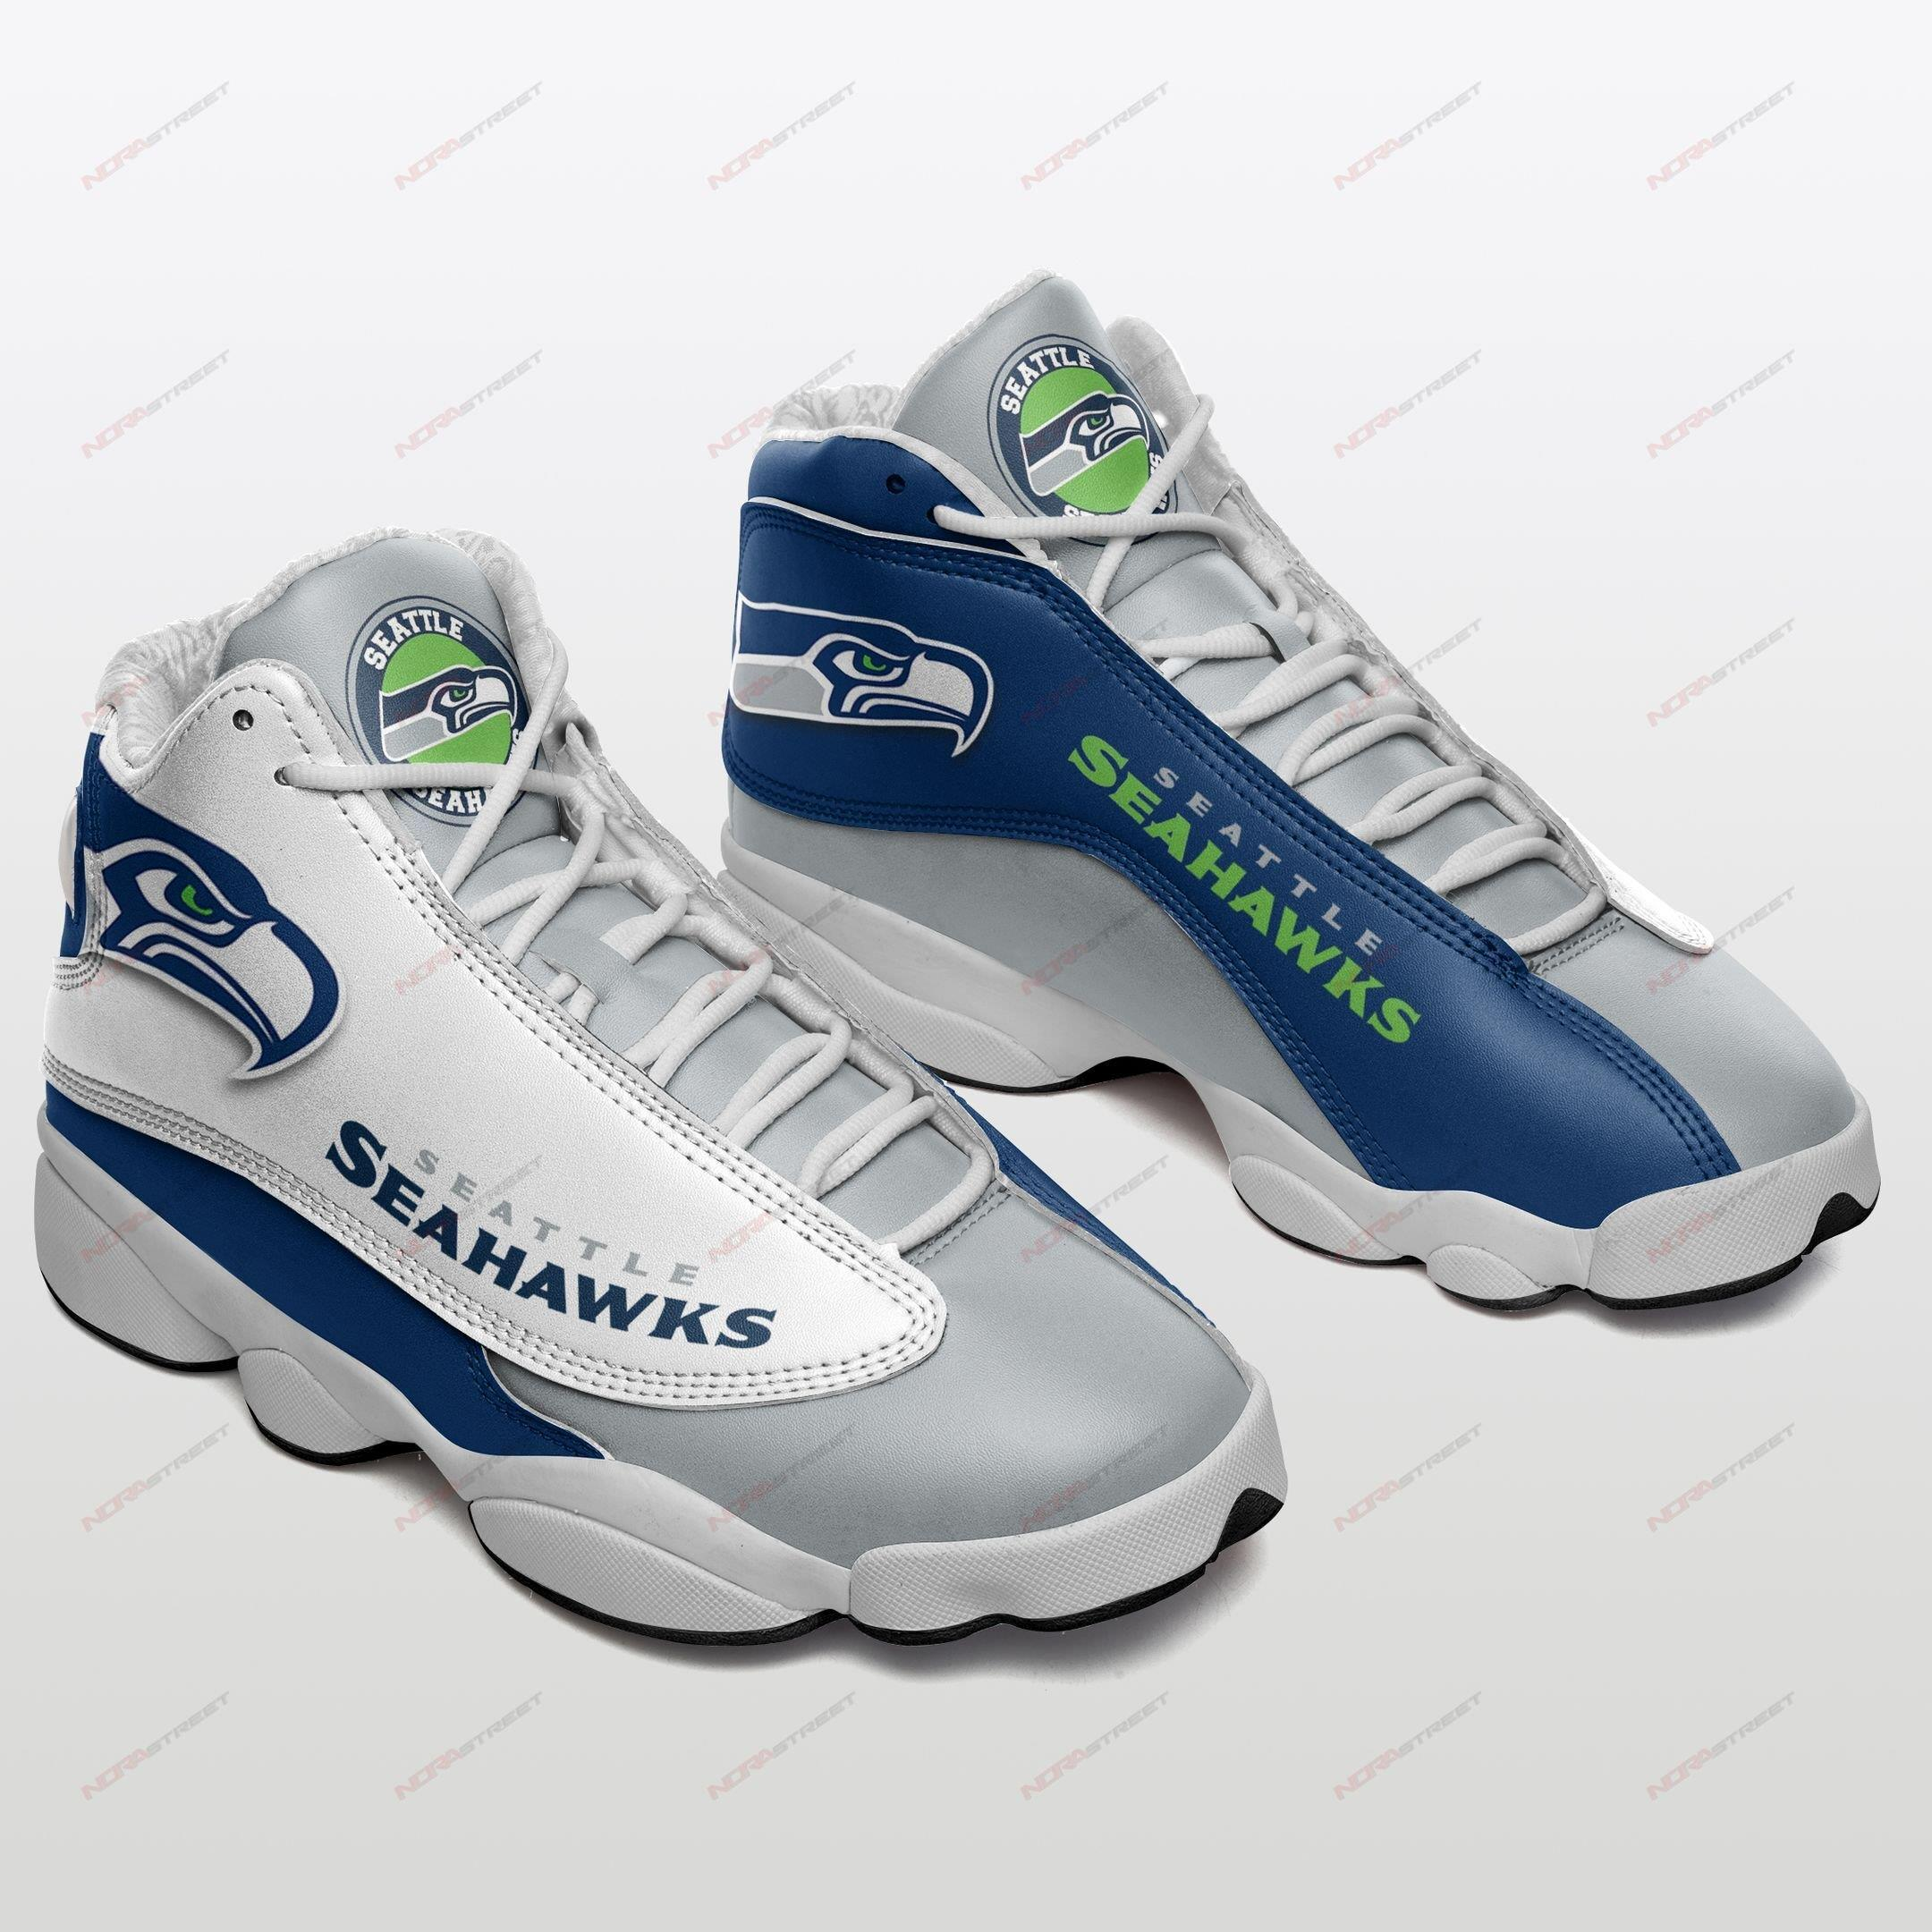 Seattle Seahawks Air Jordan 13 Sneakers Sport Shoes Plus Size